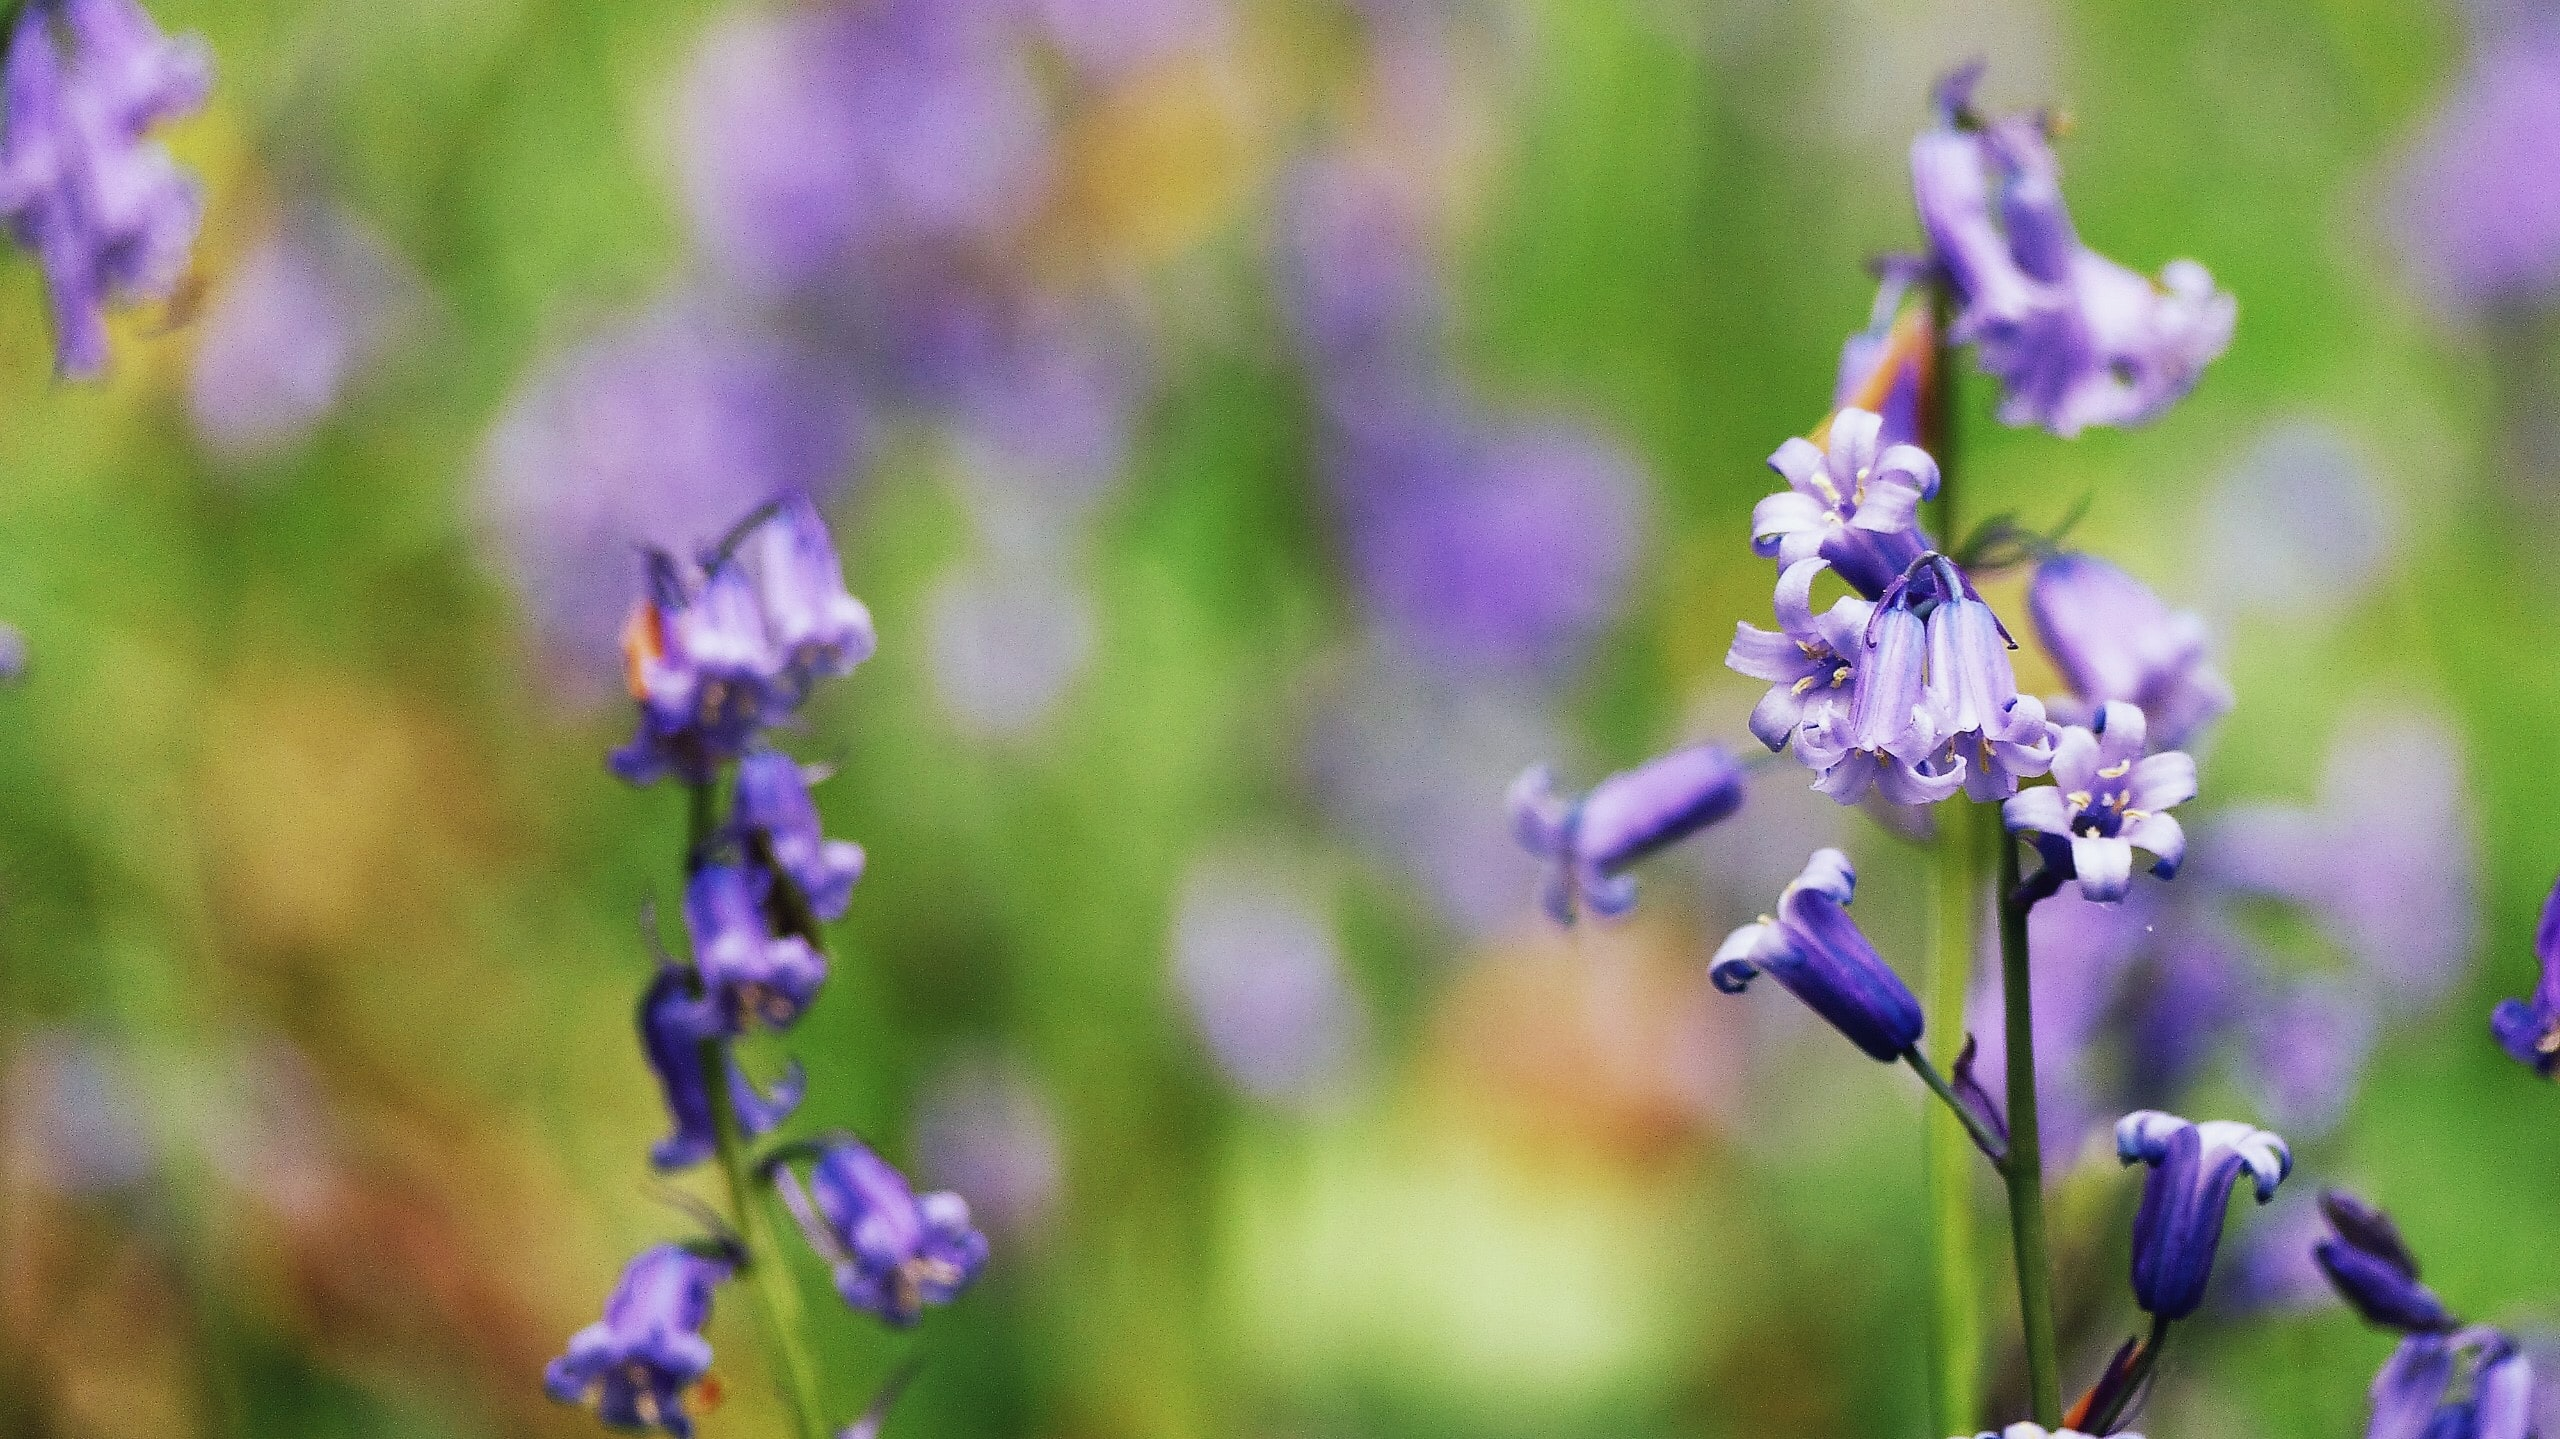 macro photography of purple petaled flowers